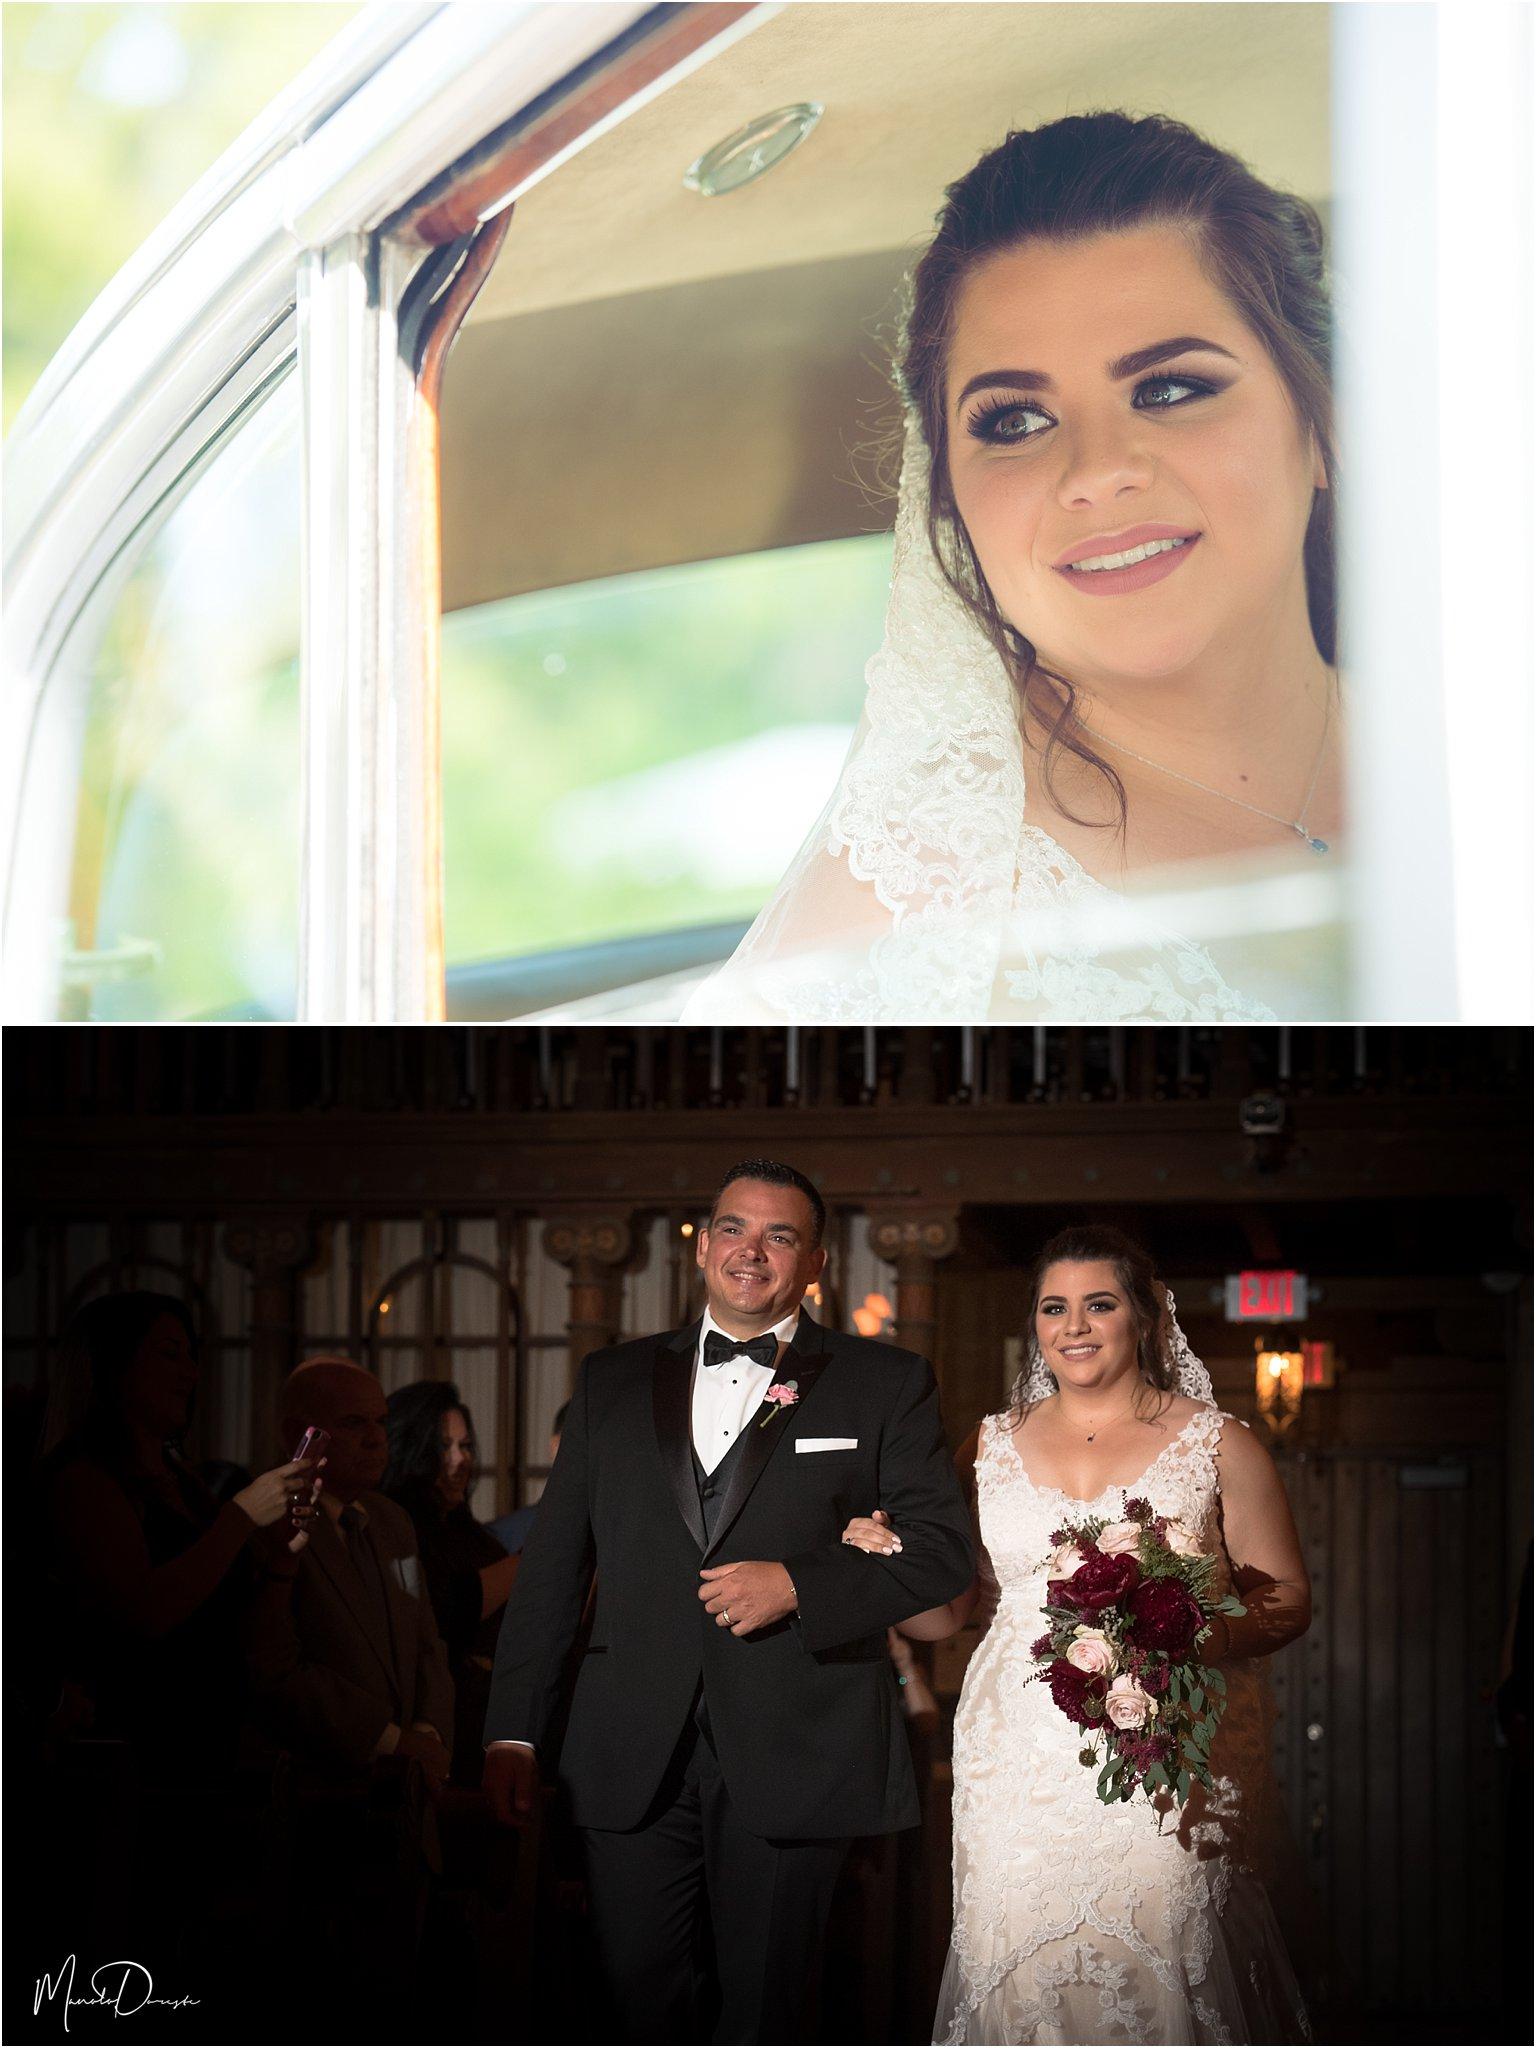 0364_ManoloDoreste_InFocusStudios_Wedding_Family_Photography_Miami_MiamiPhotographer.jpg